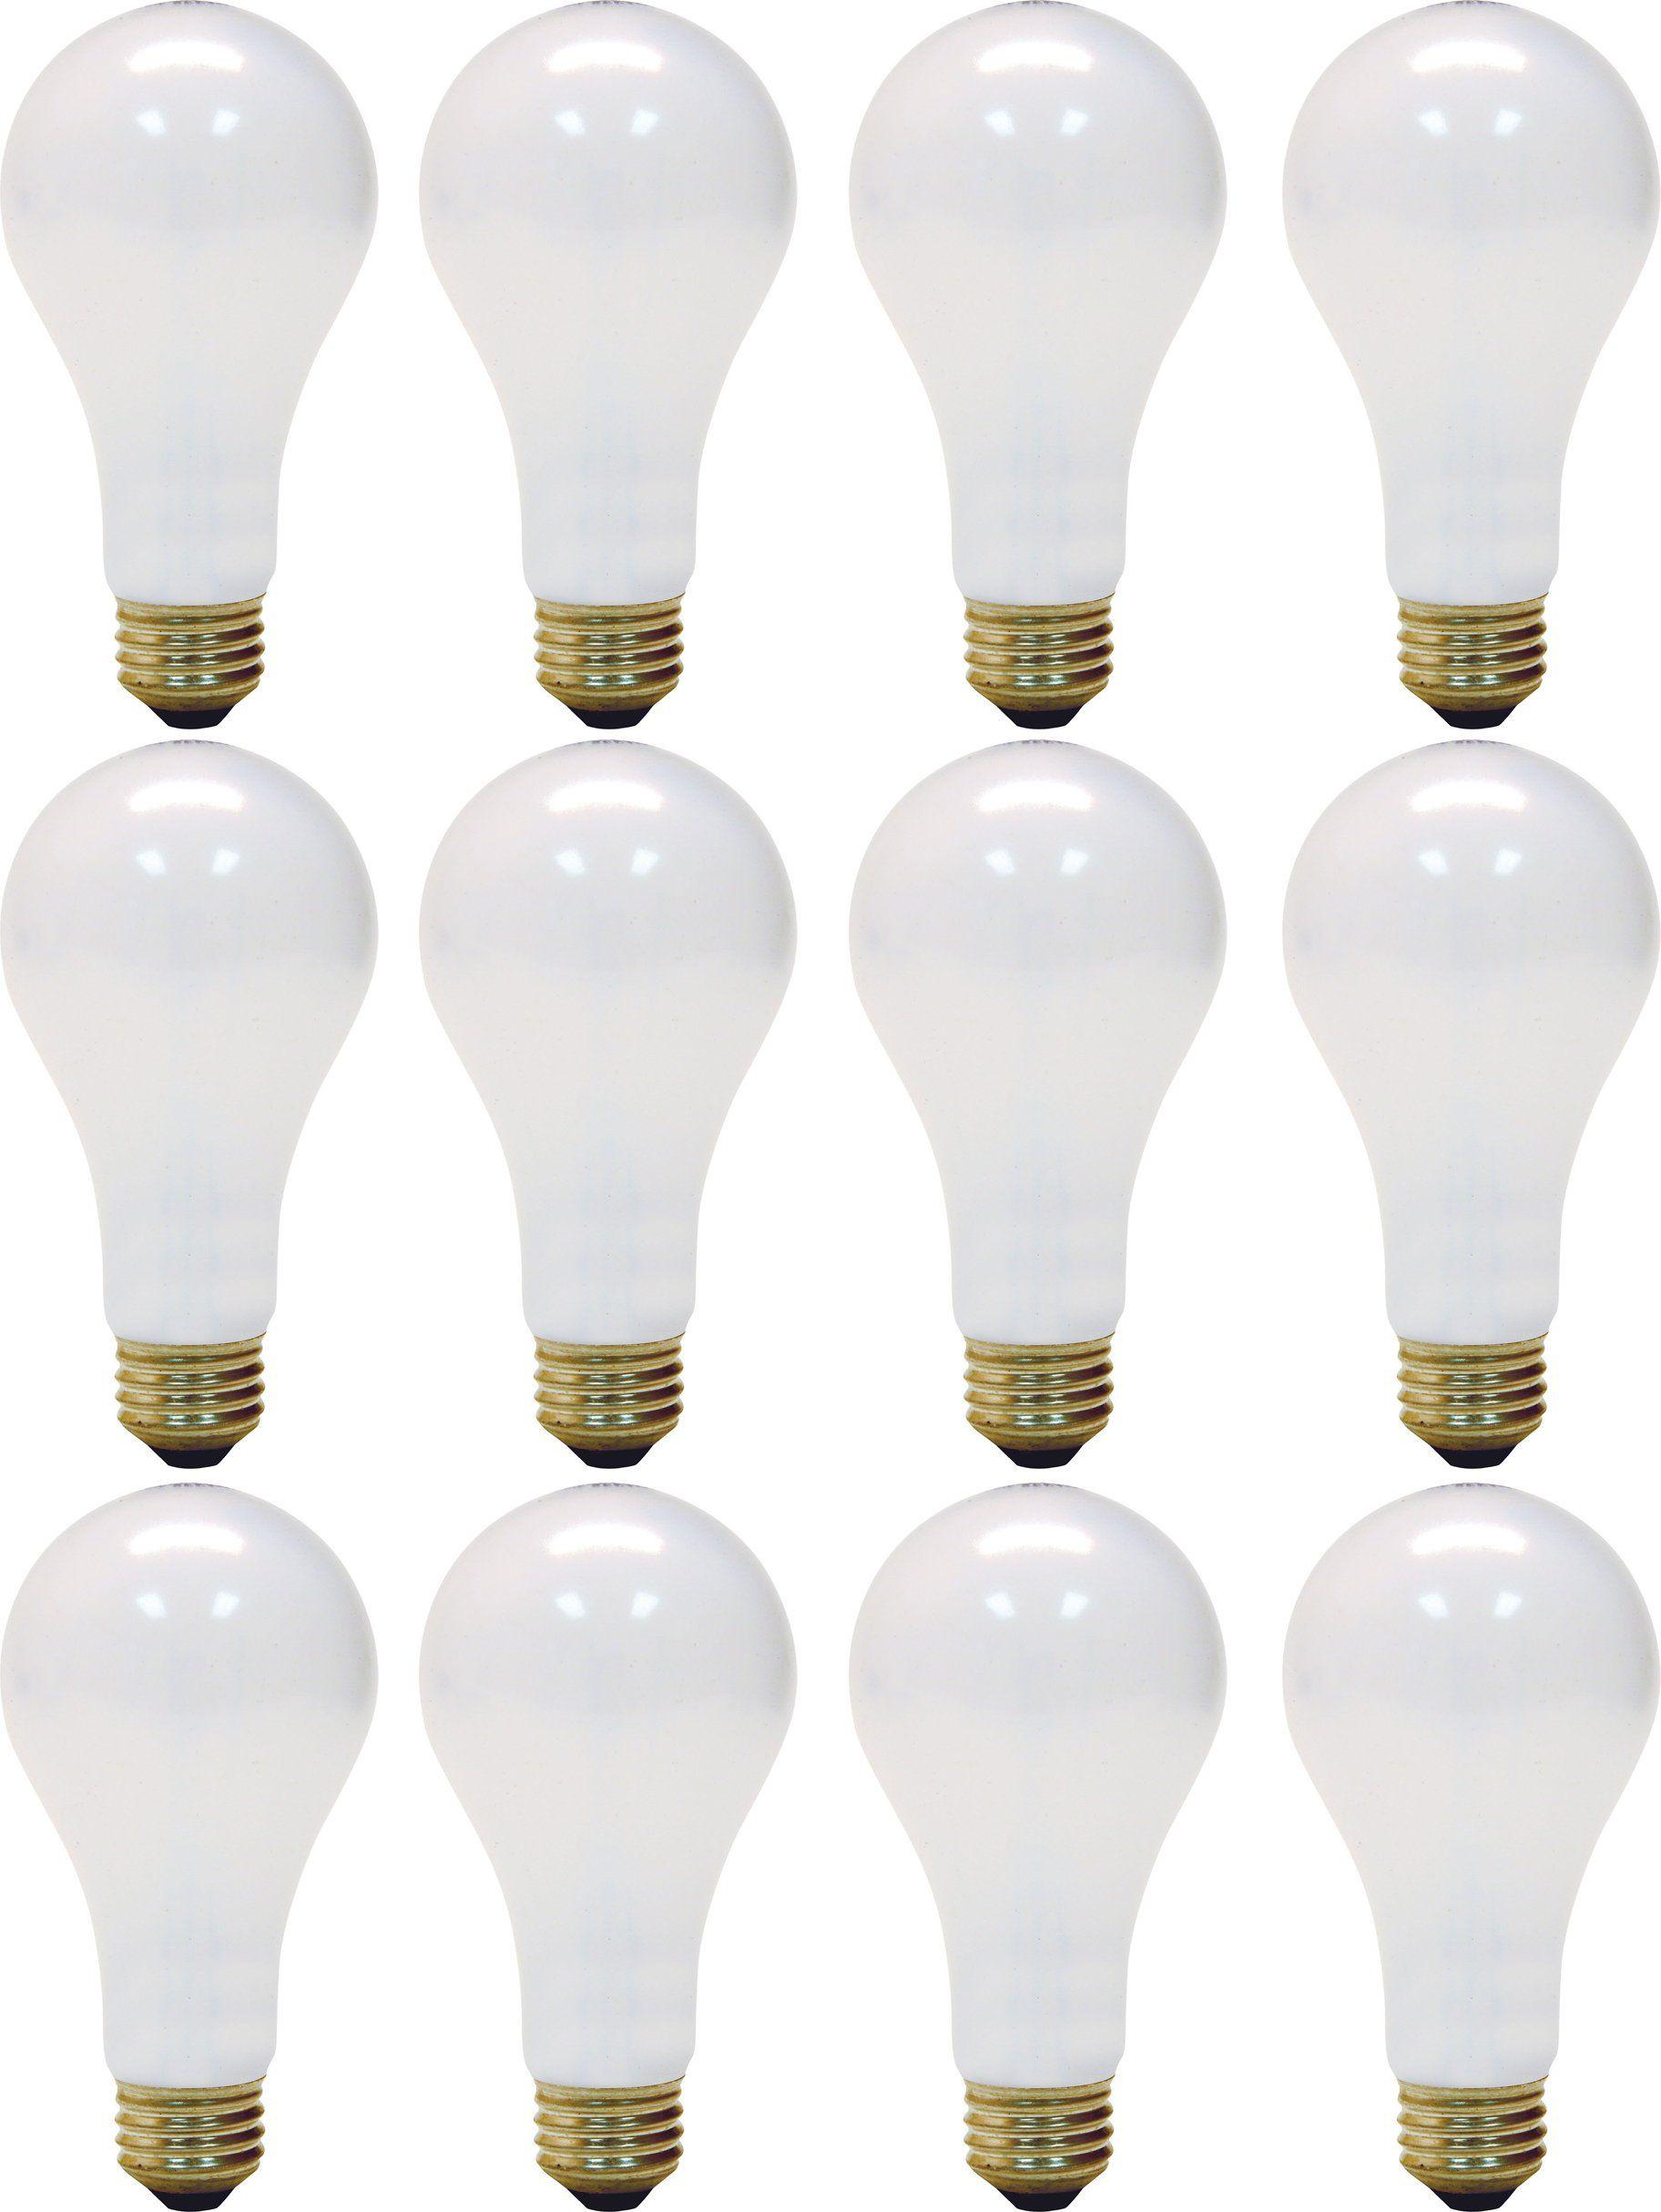 Ge Lighting Soft White 3 Way 97494 50 100 150 Watt 2155 Lumen A21 Light Bulb With Medium Base 12 Pack Ad Watt Spon Lightin Ge Lighting Light Bulb Bulb